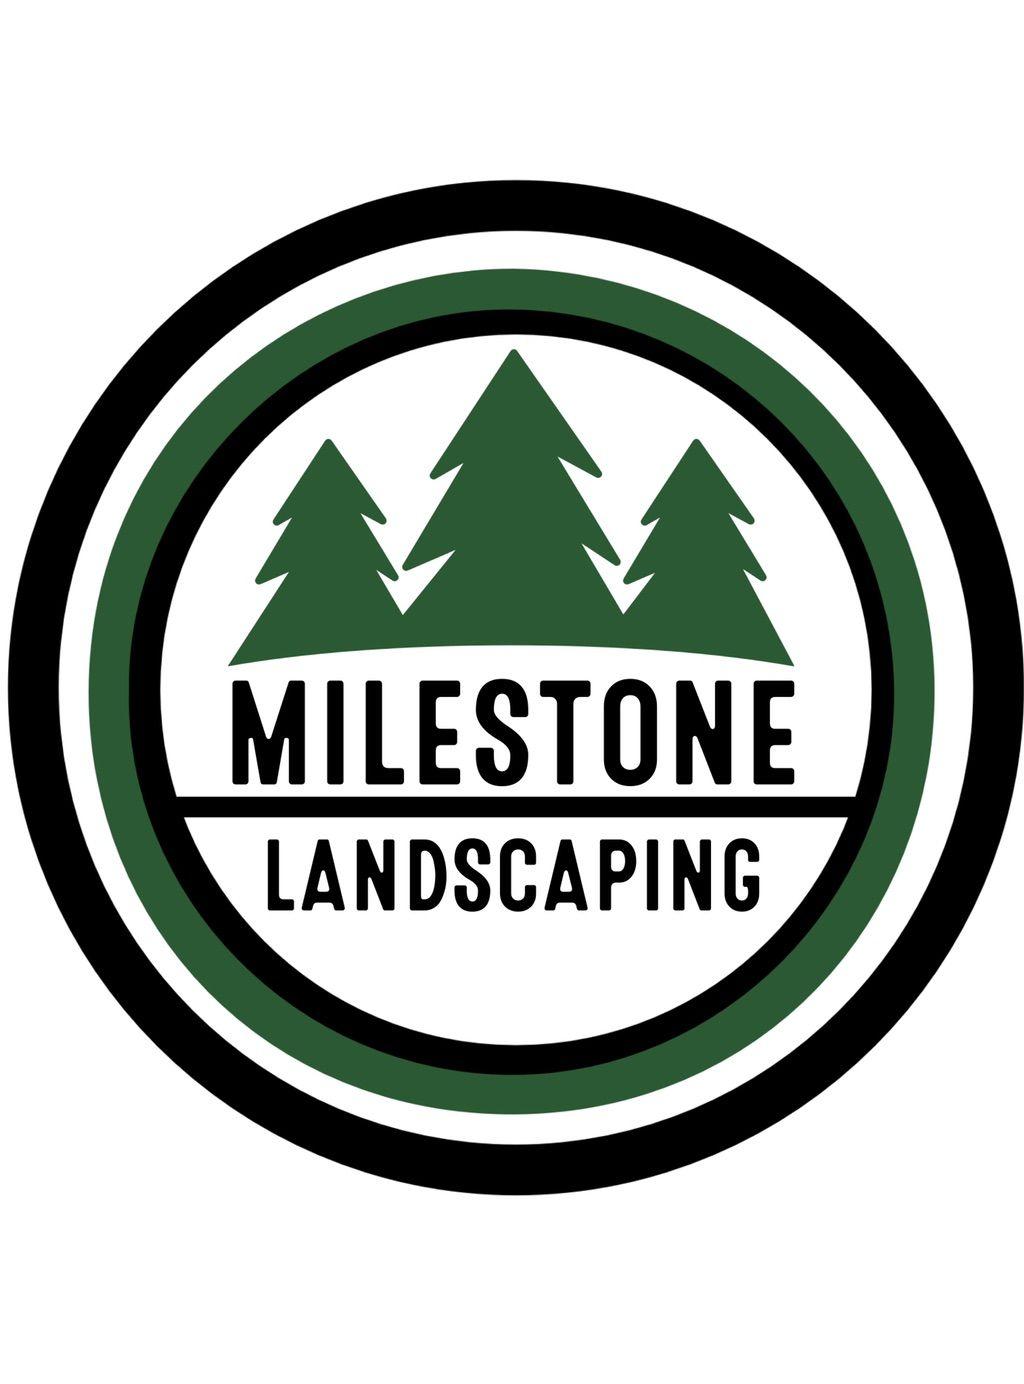 Milestone Landscaping LLC